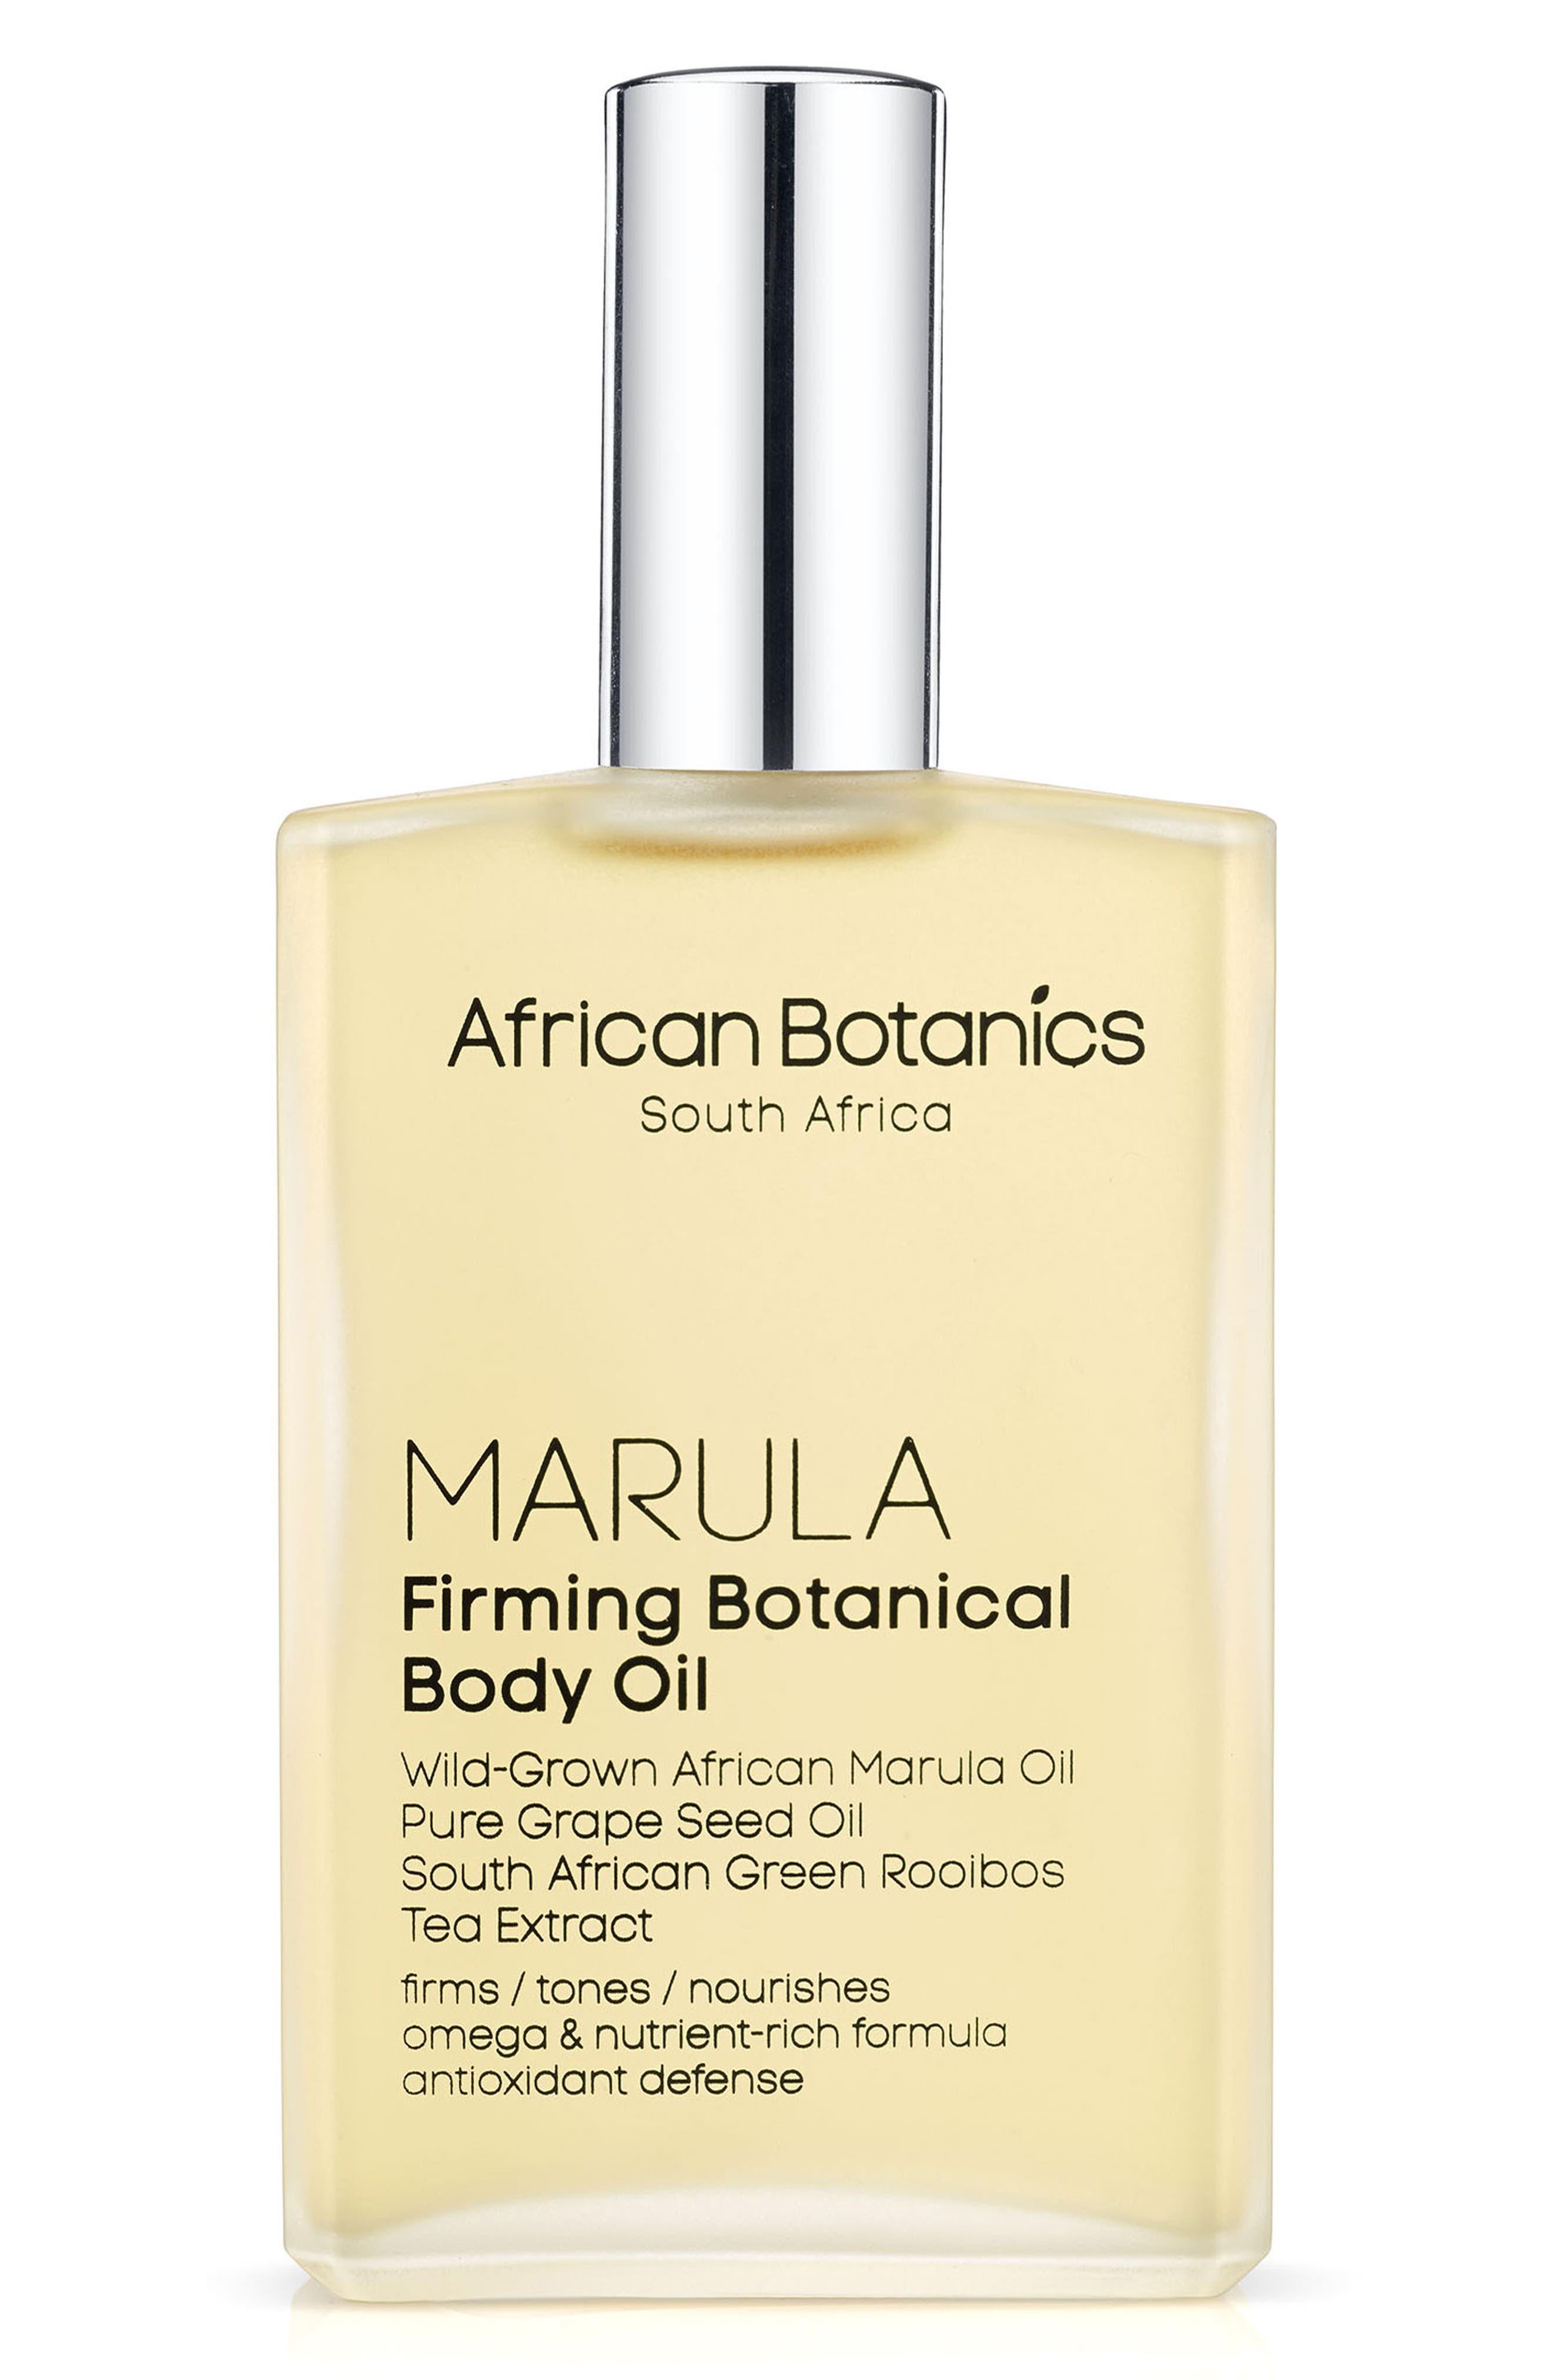 Marula Firming Botanical Body Oil,                             Main thumbnail 1, color,                             000